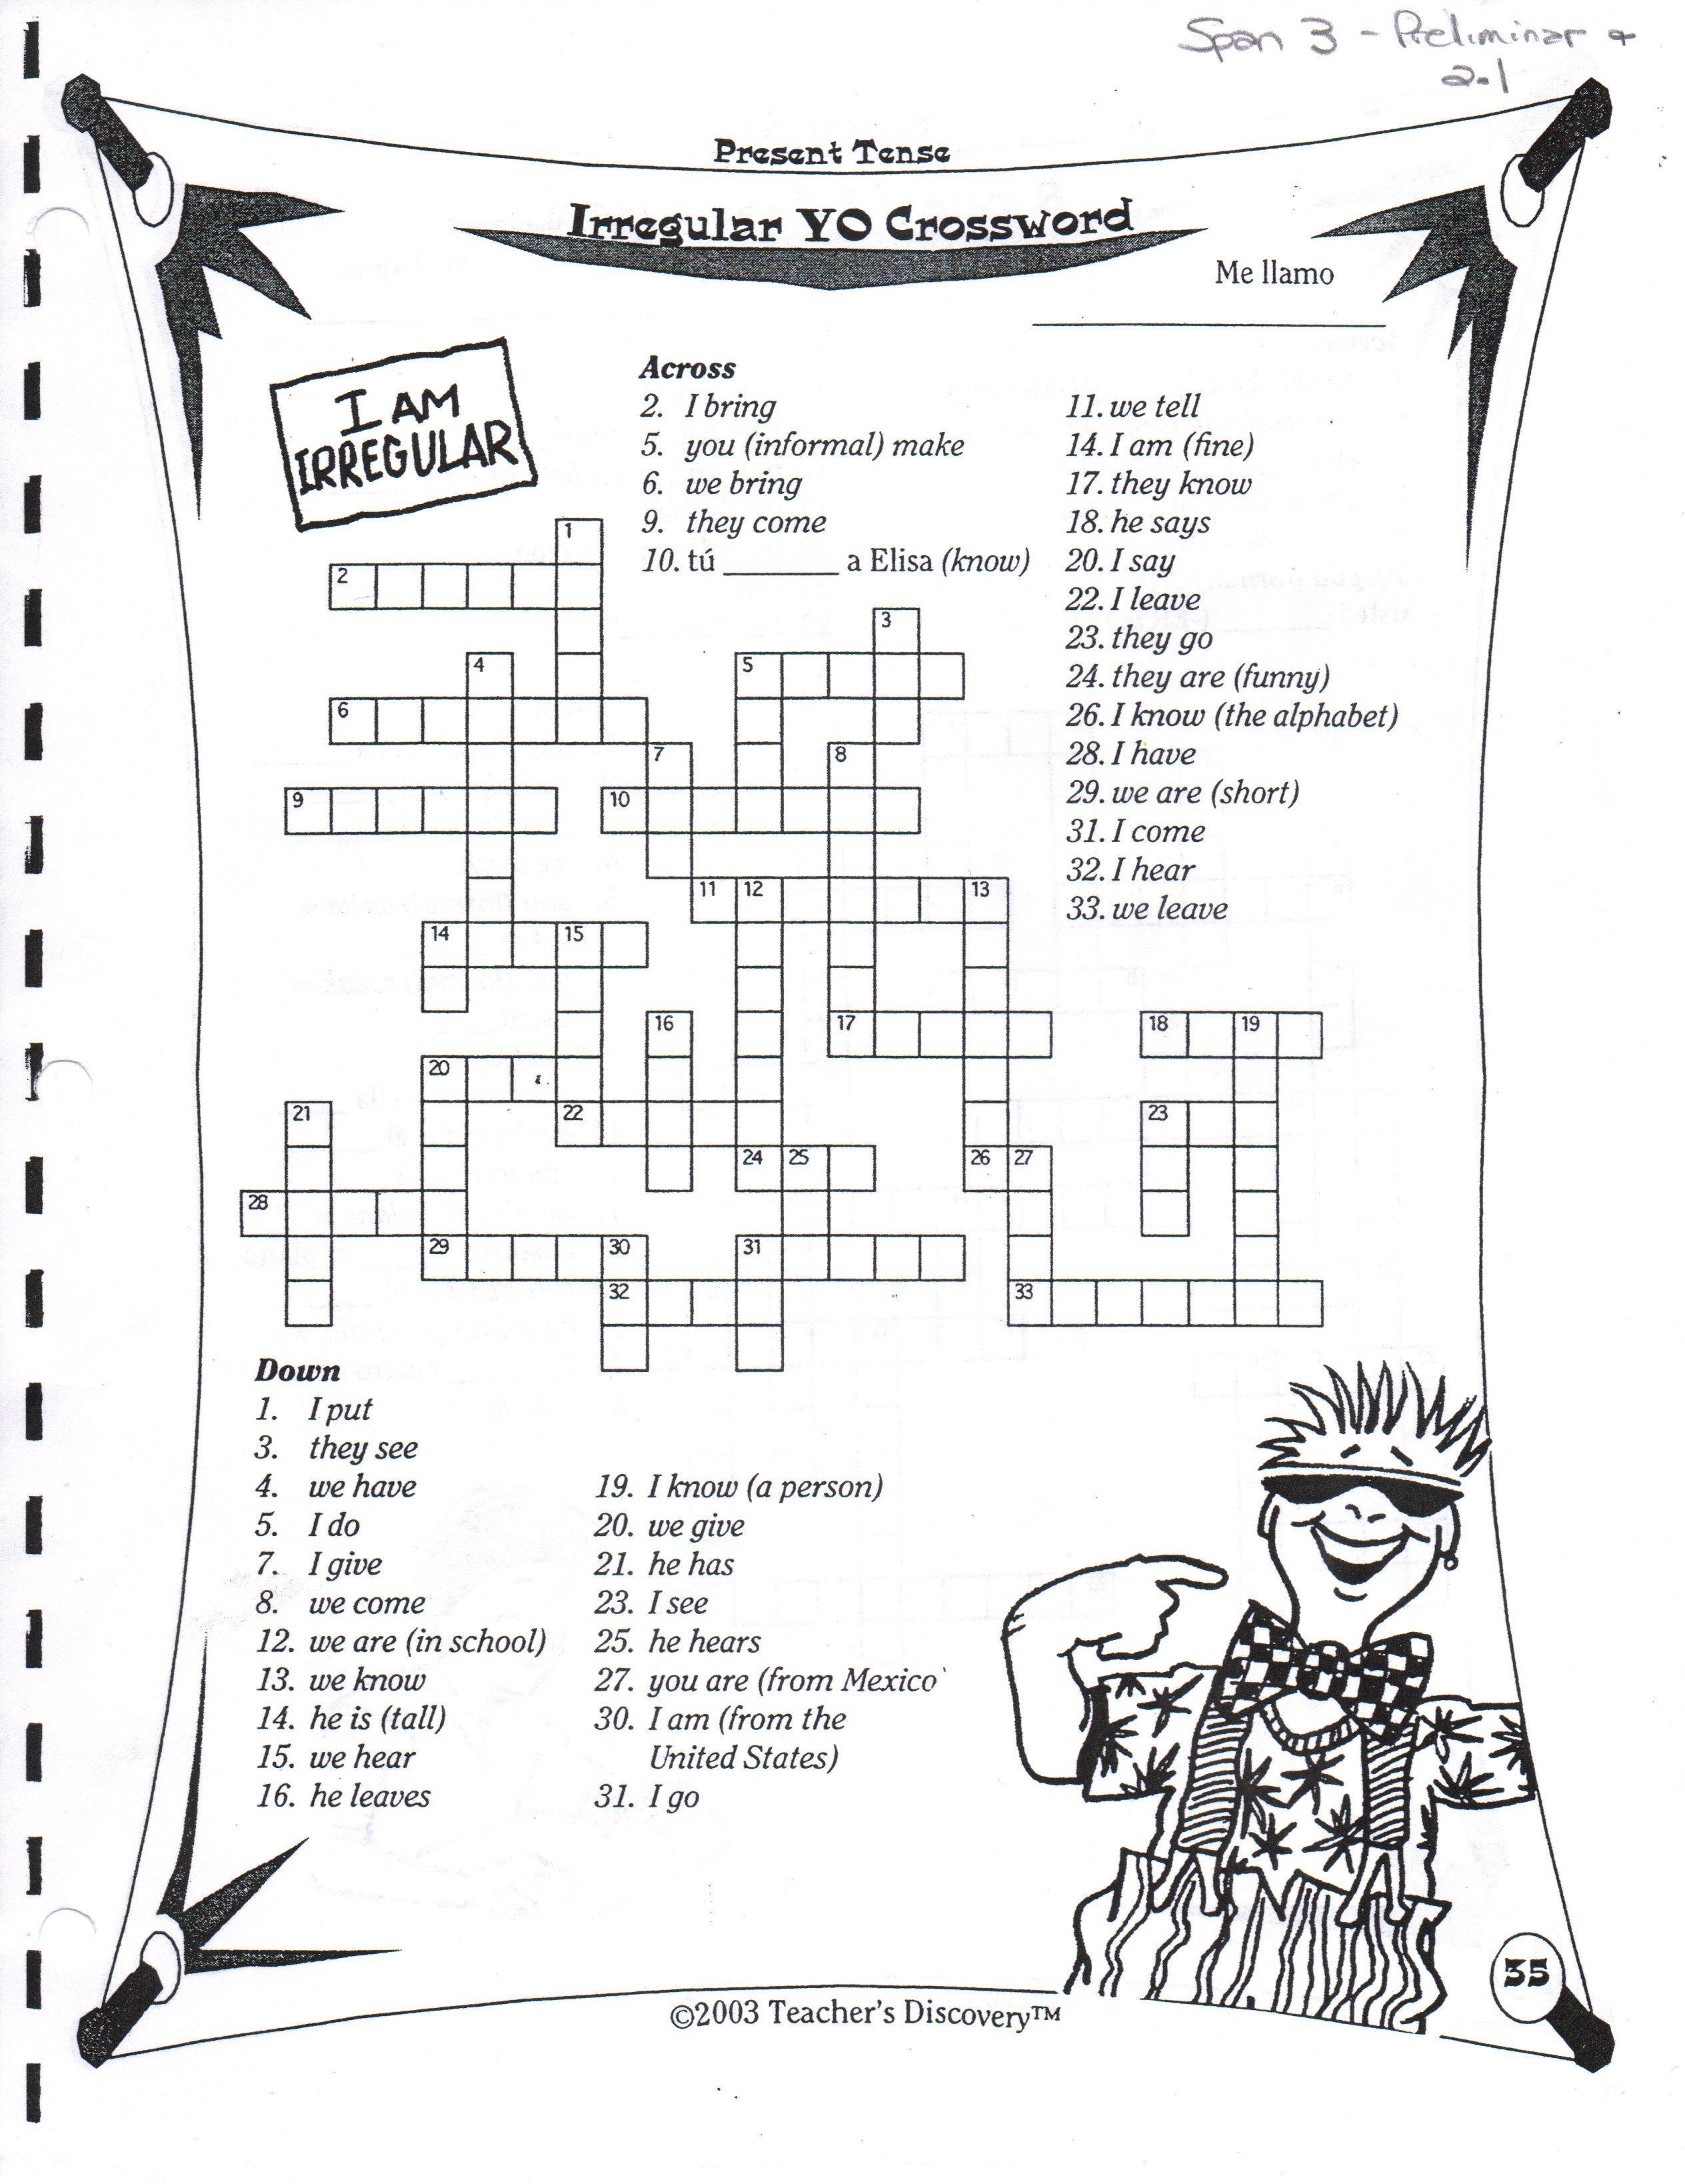 worksheet Free Printable Spanish Worksheets spanish greetings farewells expressions of courtesy crossword puzzles for class present tense yo irregulars crucigrama